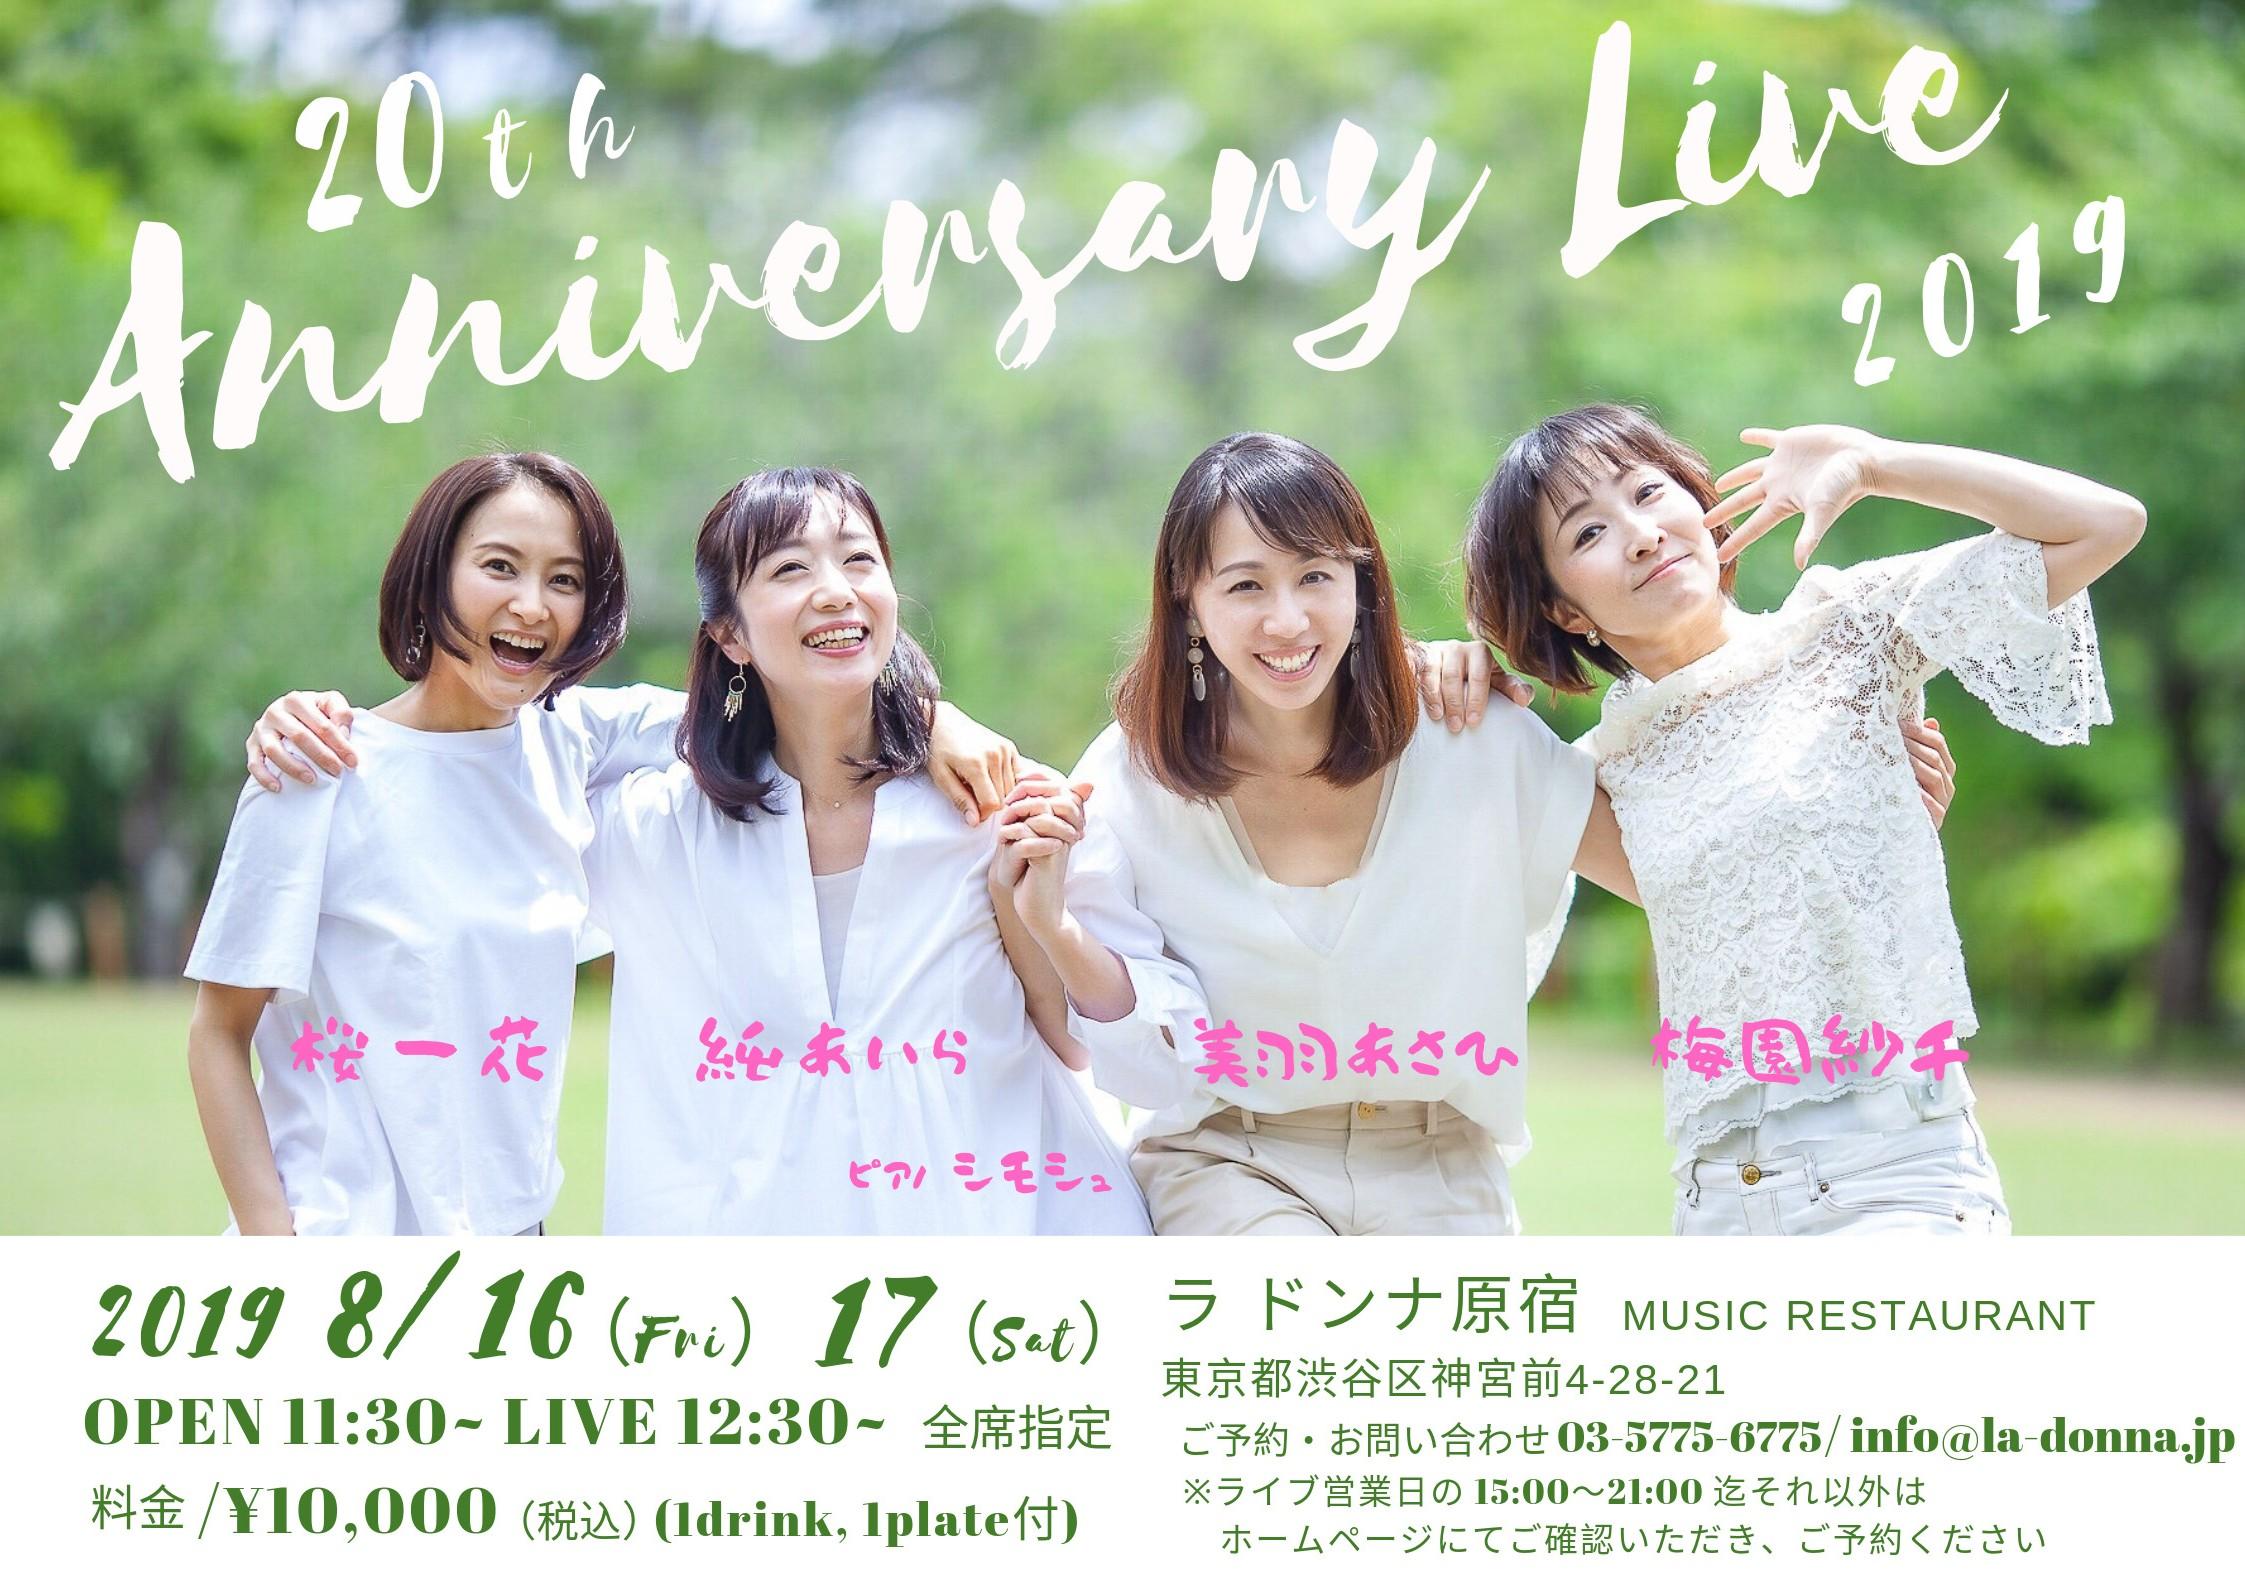 20th Anniversary Live 2019